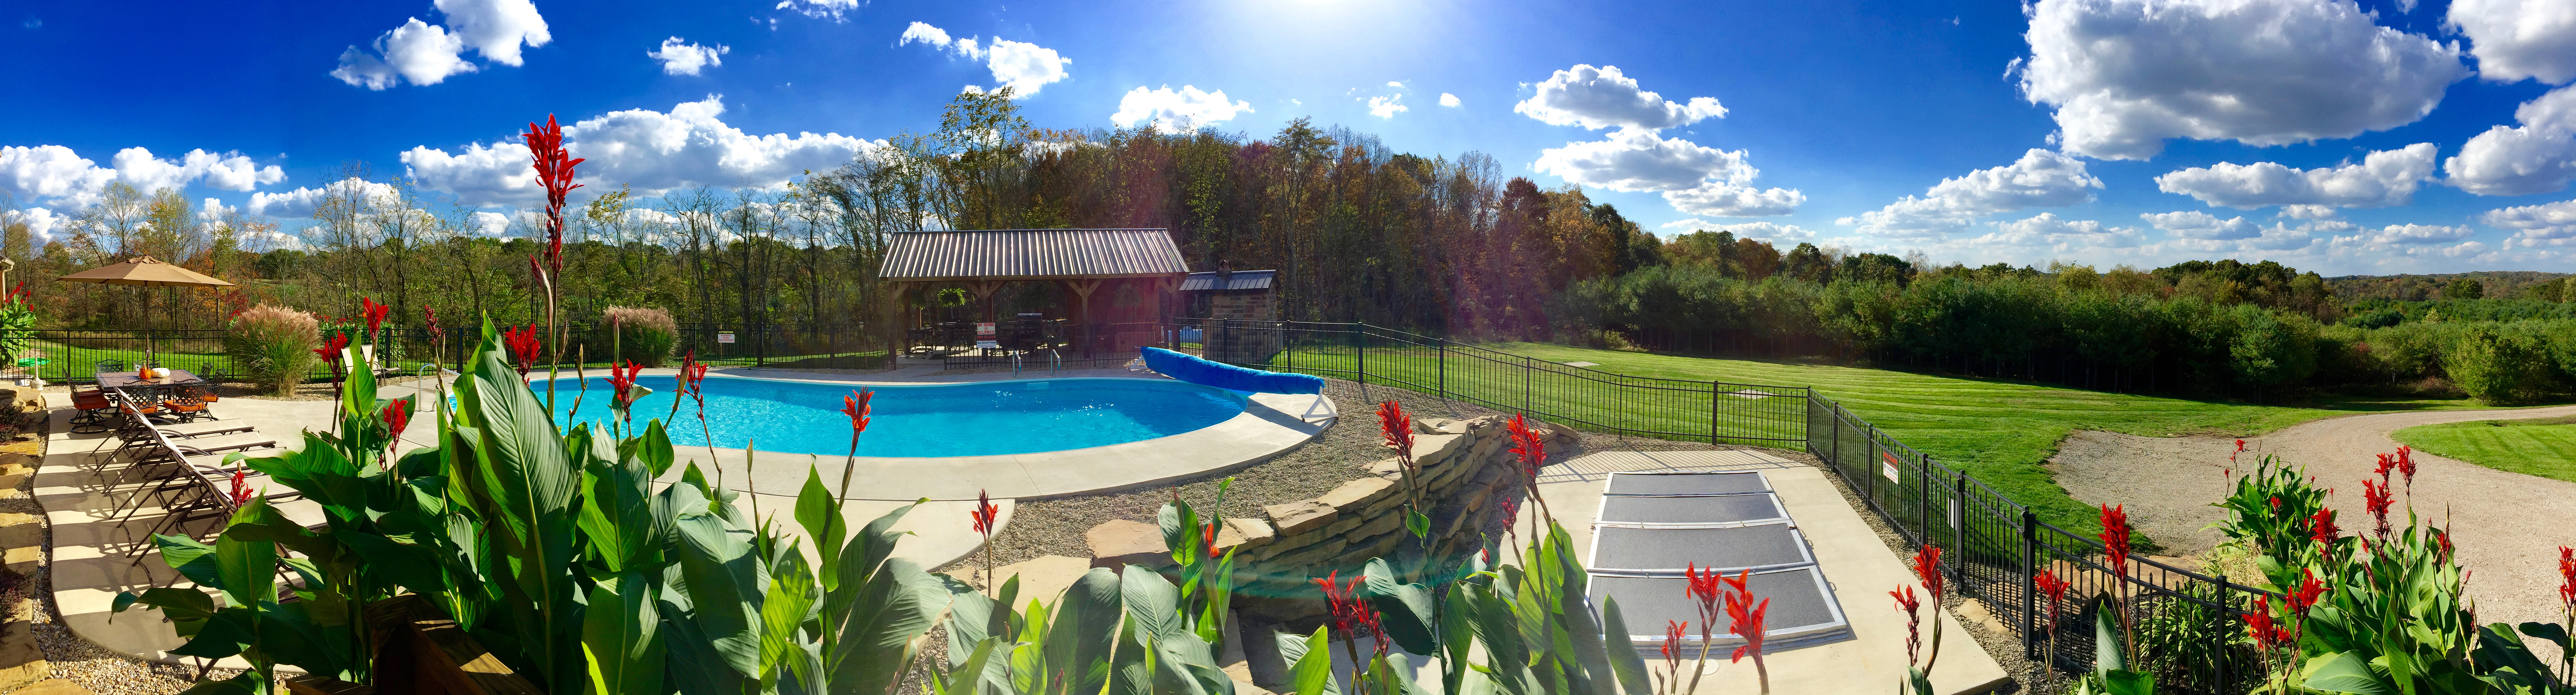 Outdoor Spaces & Grounds | Bourbon Ridge Retreat | Hocking